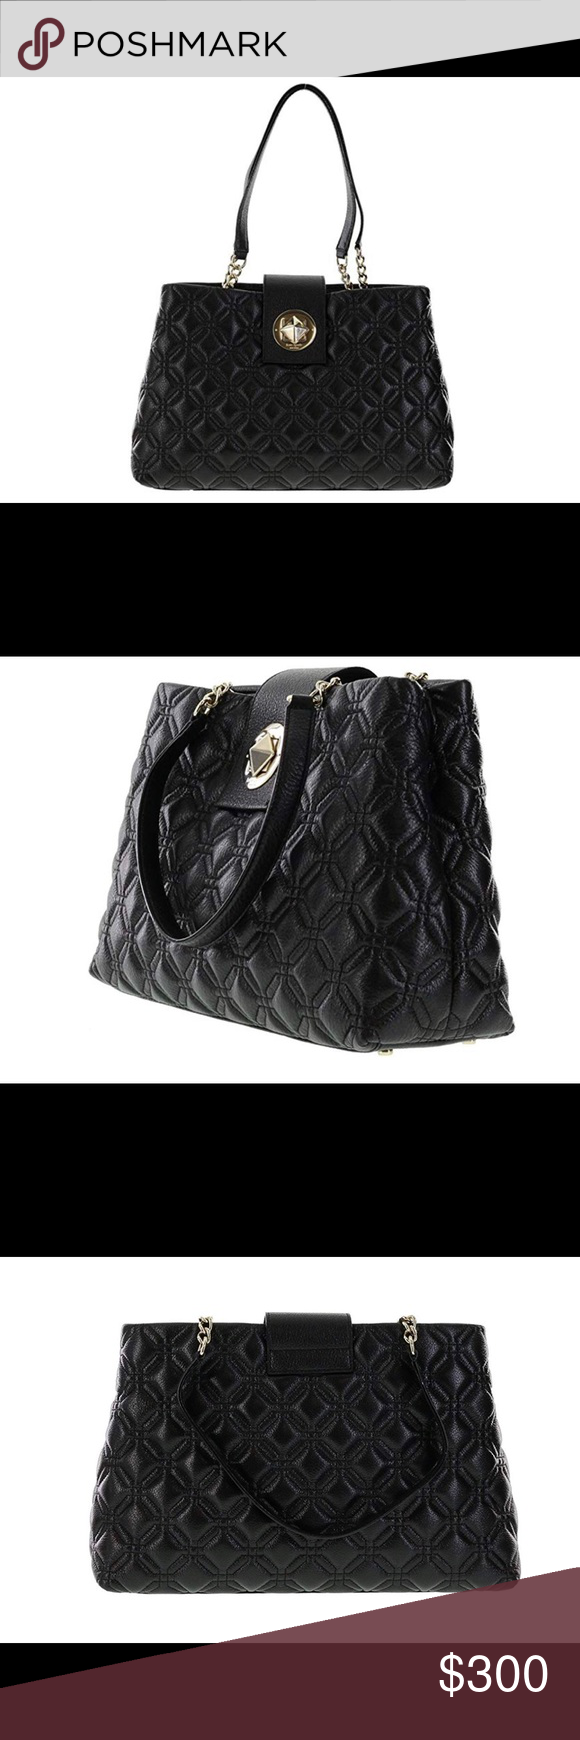 e93d79259b1b Kate Spade shoulder bag Beautiful Kate Spade   Astor Court Elena   over the  shoulder bag.Quilted black leather with light gold plated hardware.